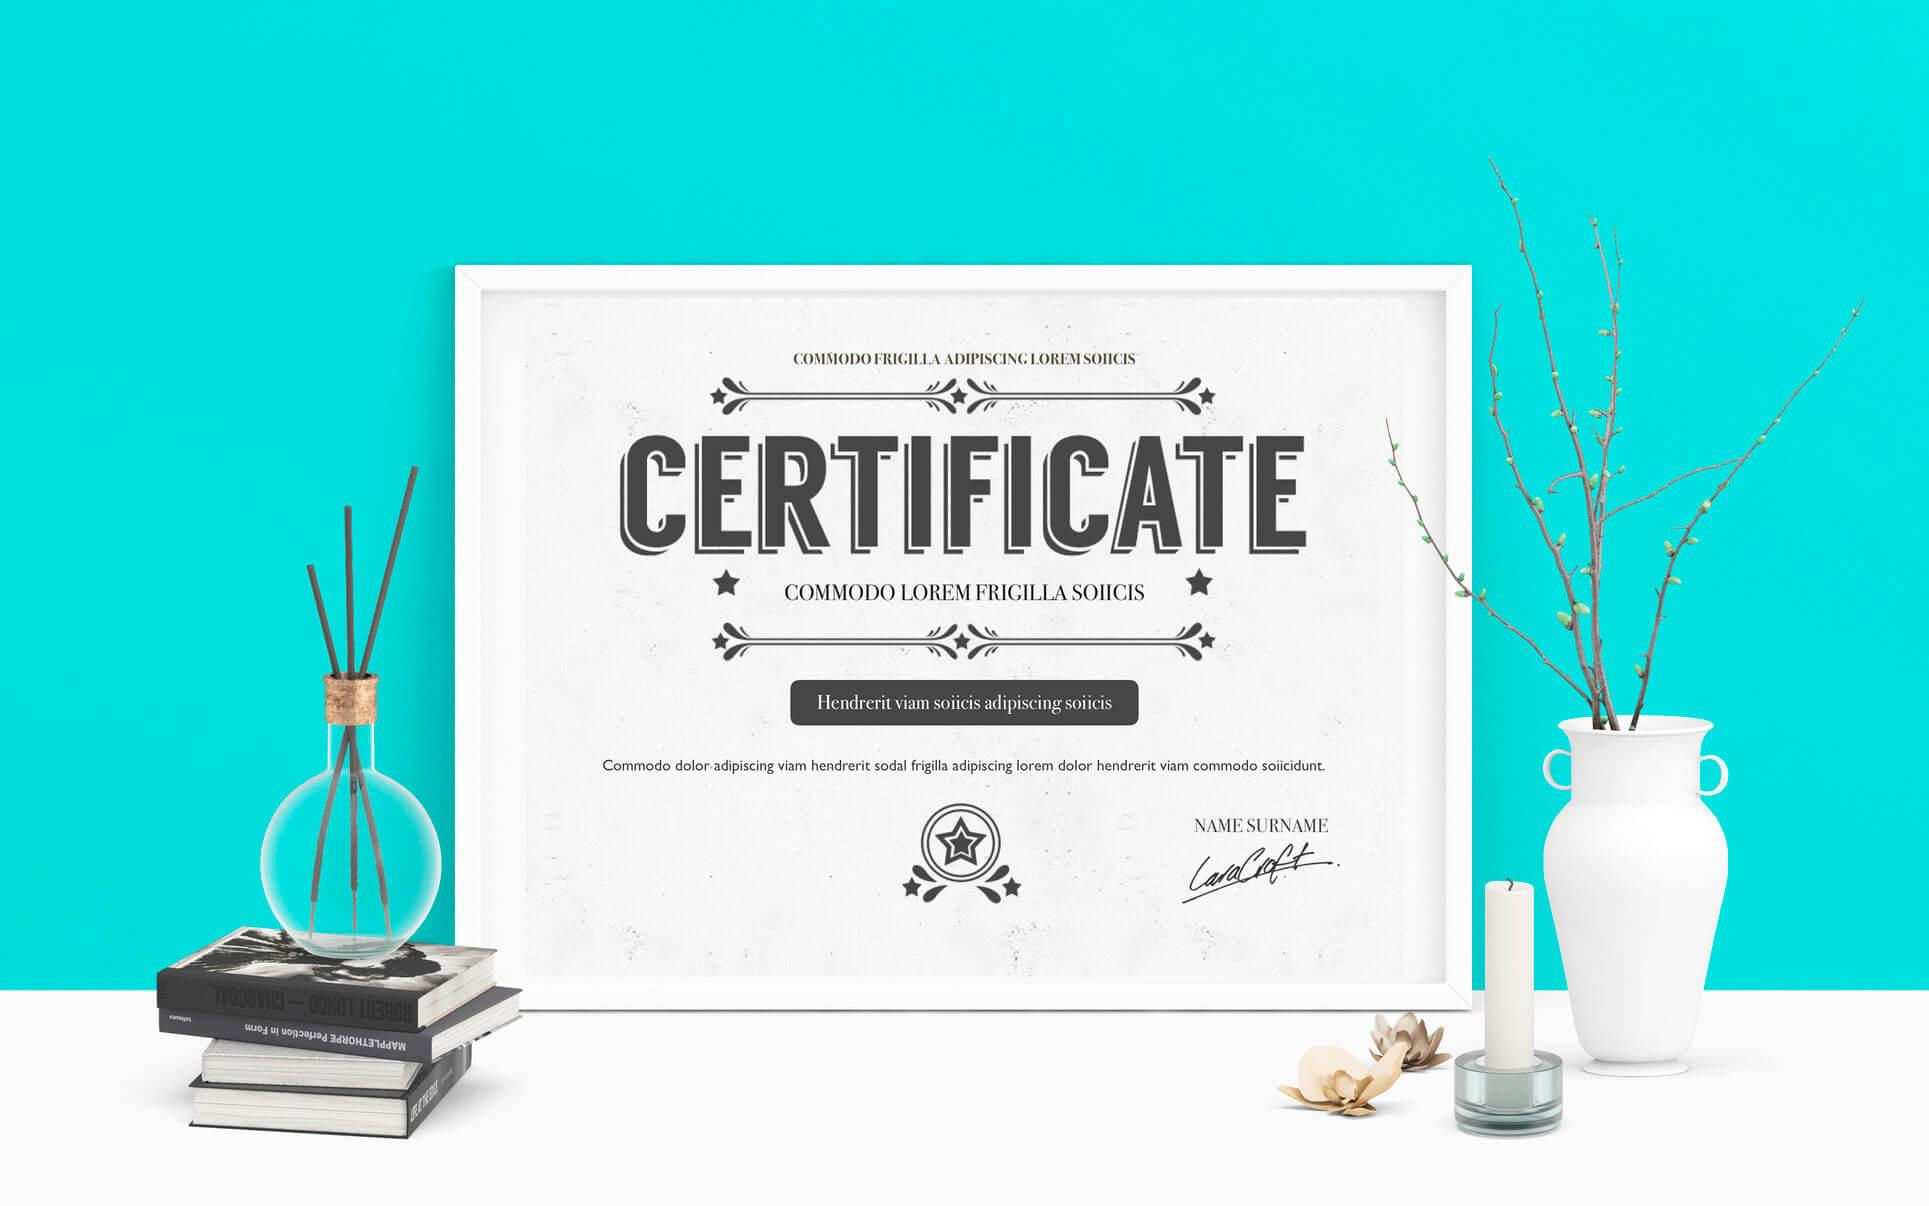 Certificate Templates Design 201 Download Macos With 10 Certificate Of Championship Template Designs Free